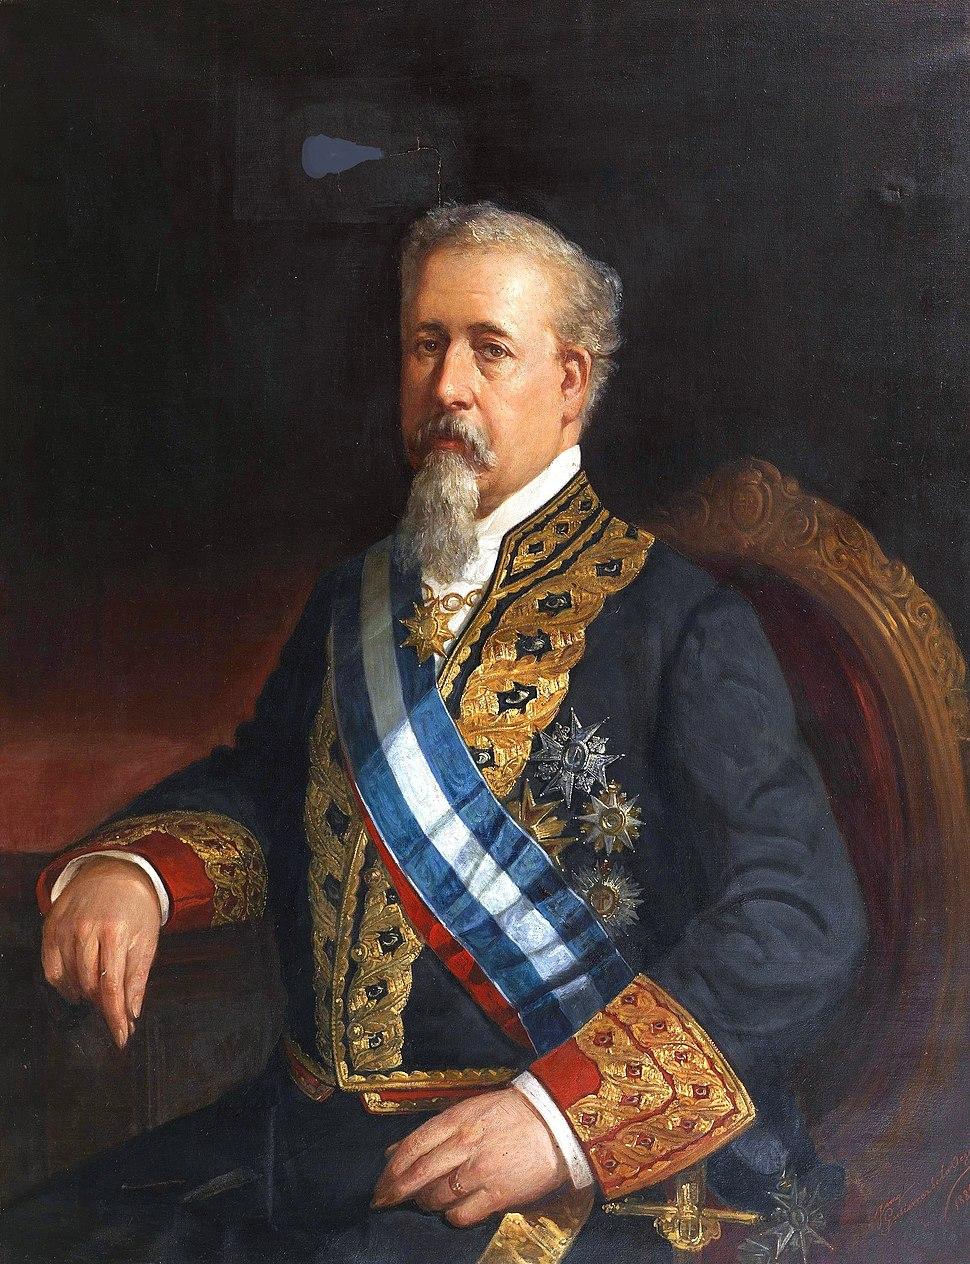 Antonio Romero Ortiz, ministro de Ultramar (Museo del Prado)